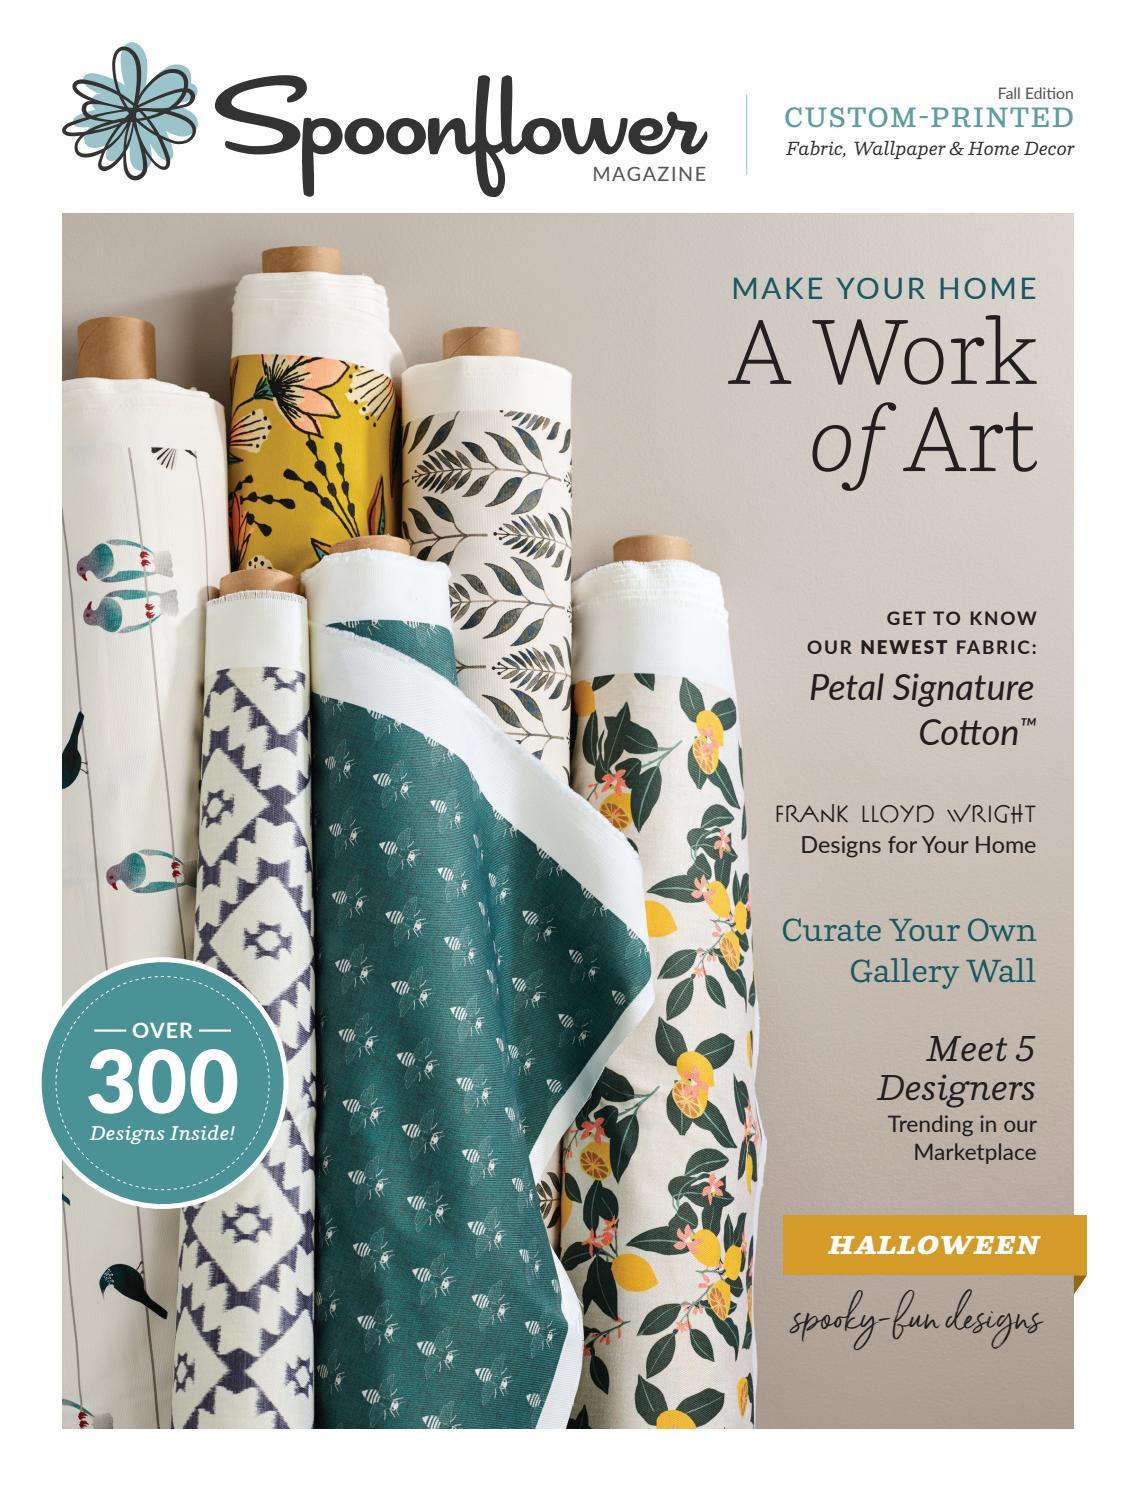 Confetti Spring//Summer Print Cotton Poplin Dress Fabric 100/% Organic Cotton